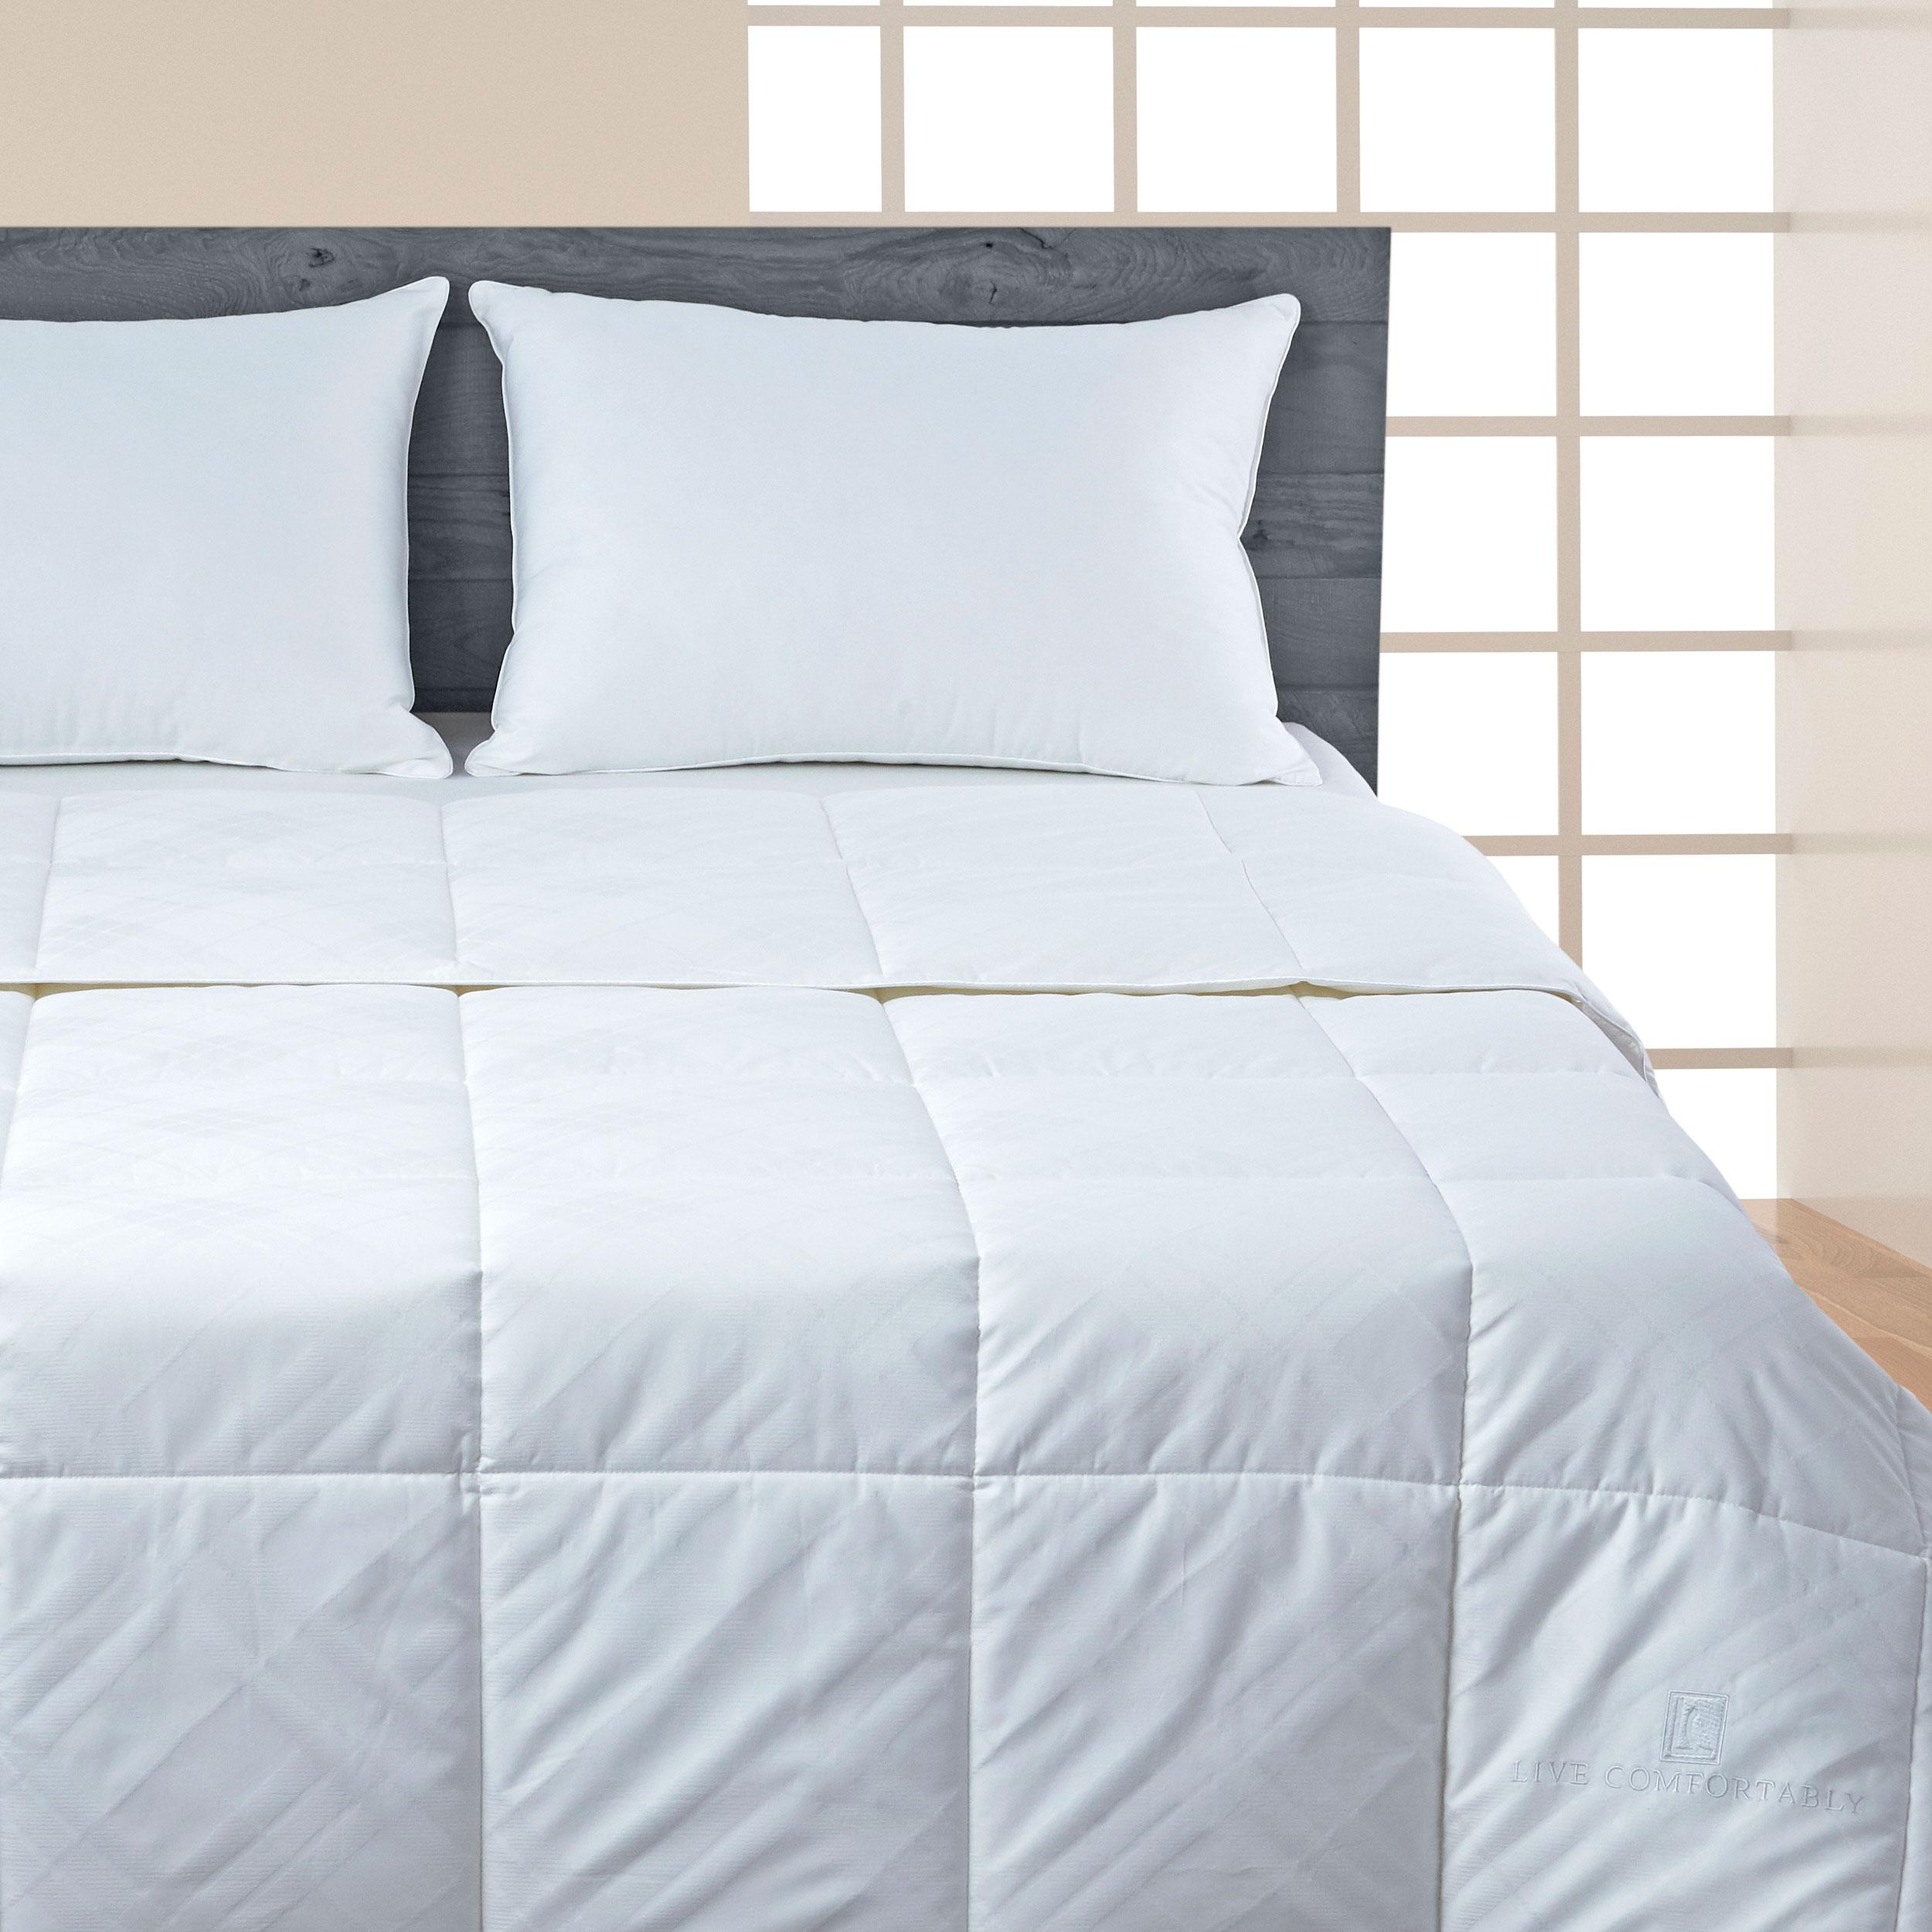 Live Comfortably 174 Dacron 174 Comforel 174 Coolfx Comforter